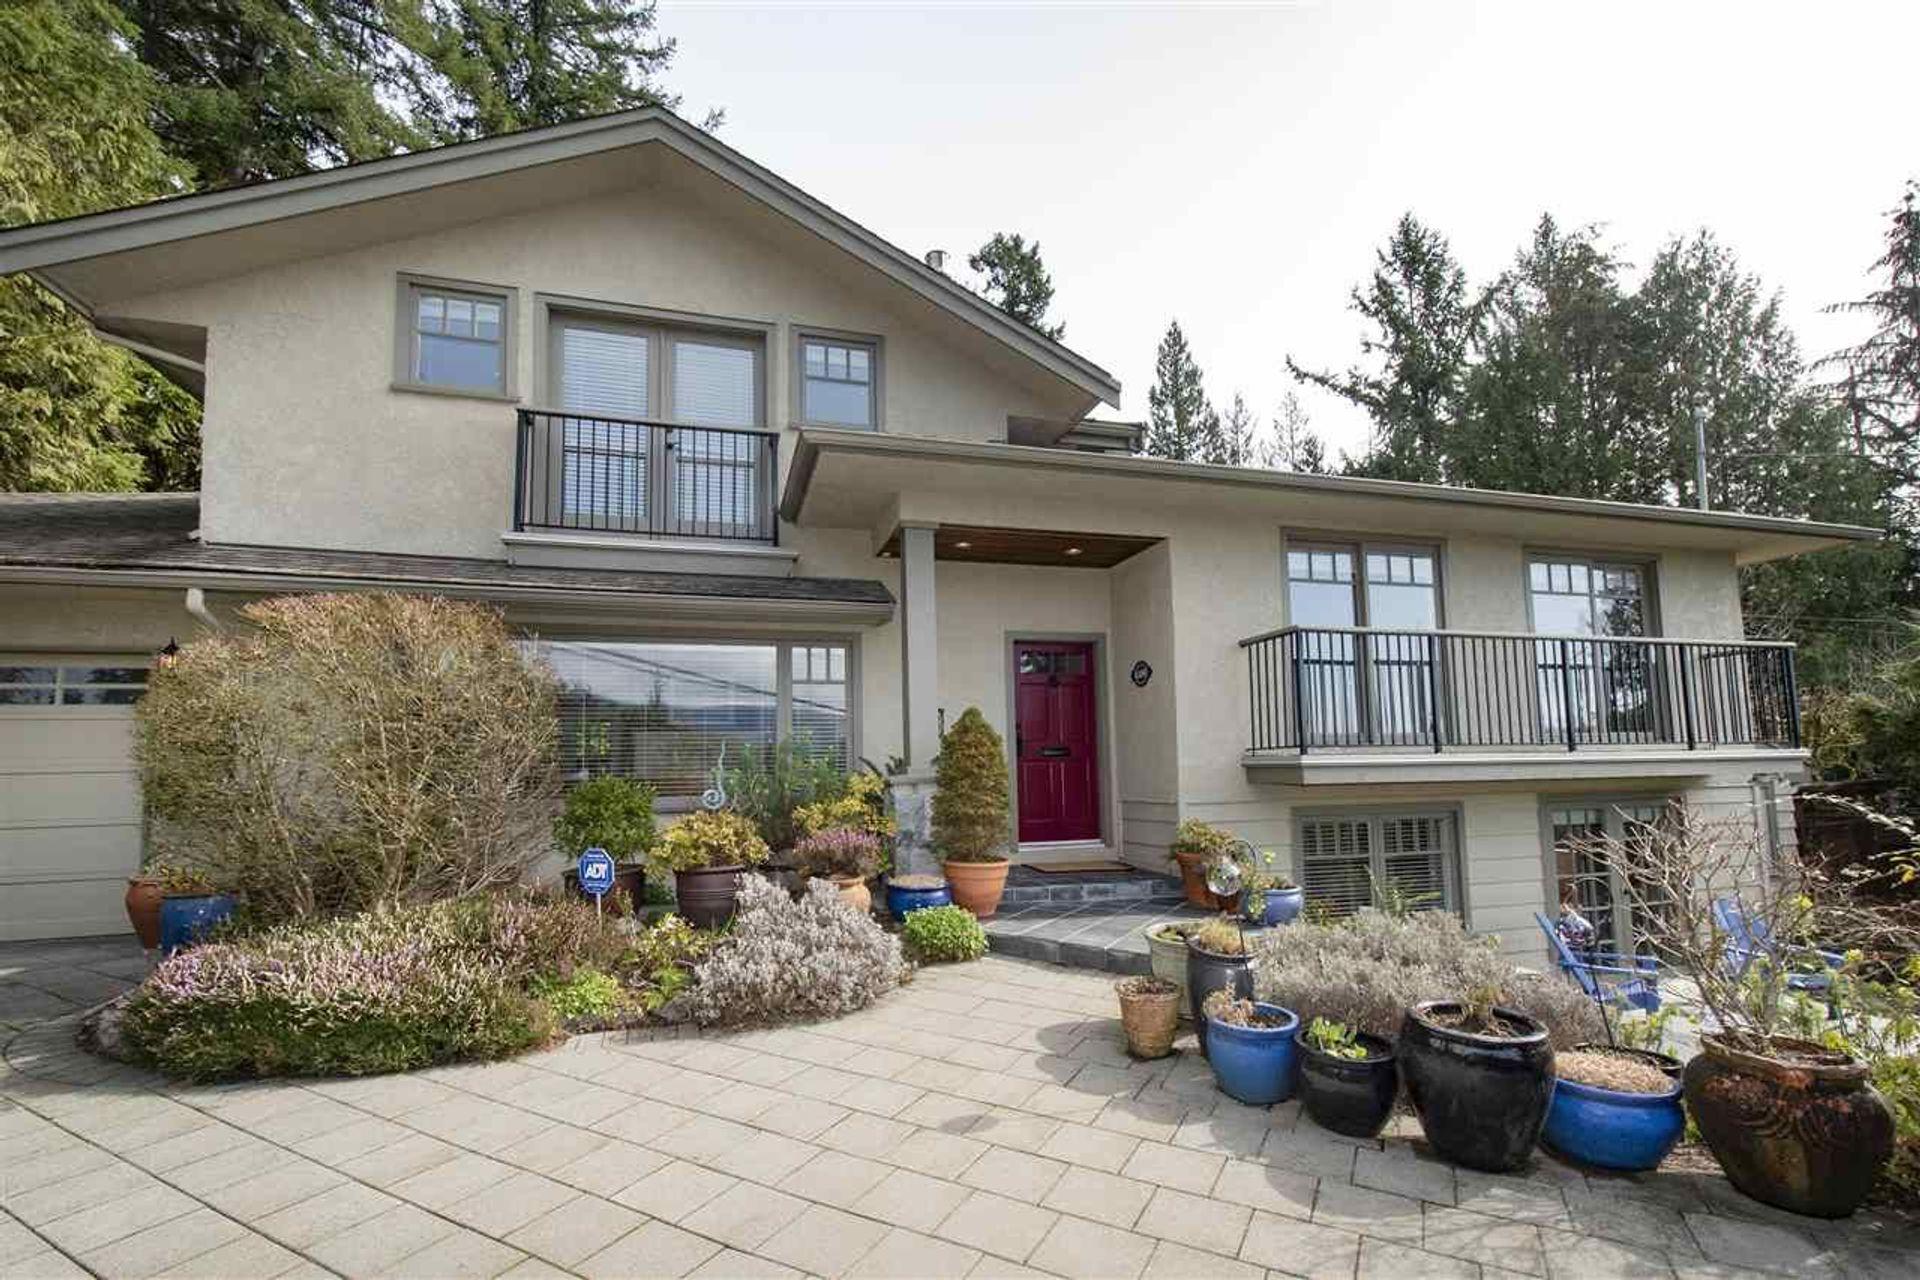 4488-skyline-drive-canyon-heights-nv-north-vancouver-03 at 4488 Skyline Drive, Canyon Heights NV, North Vancouver